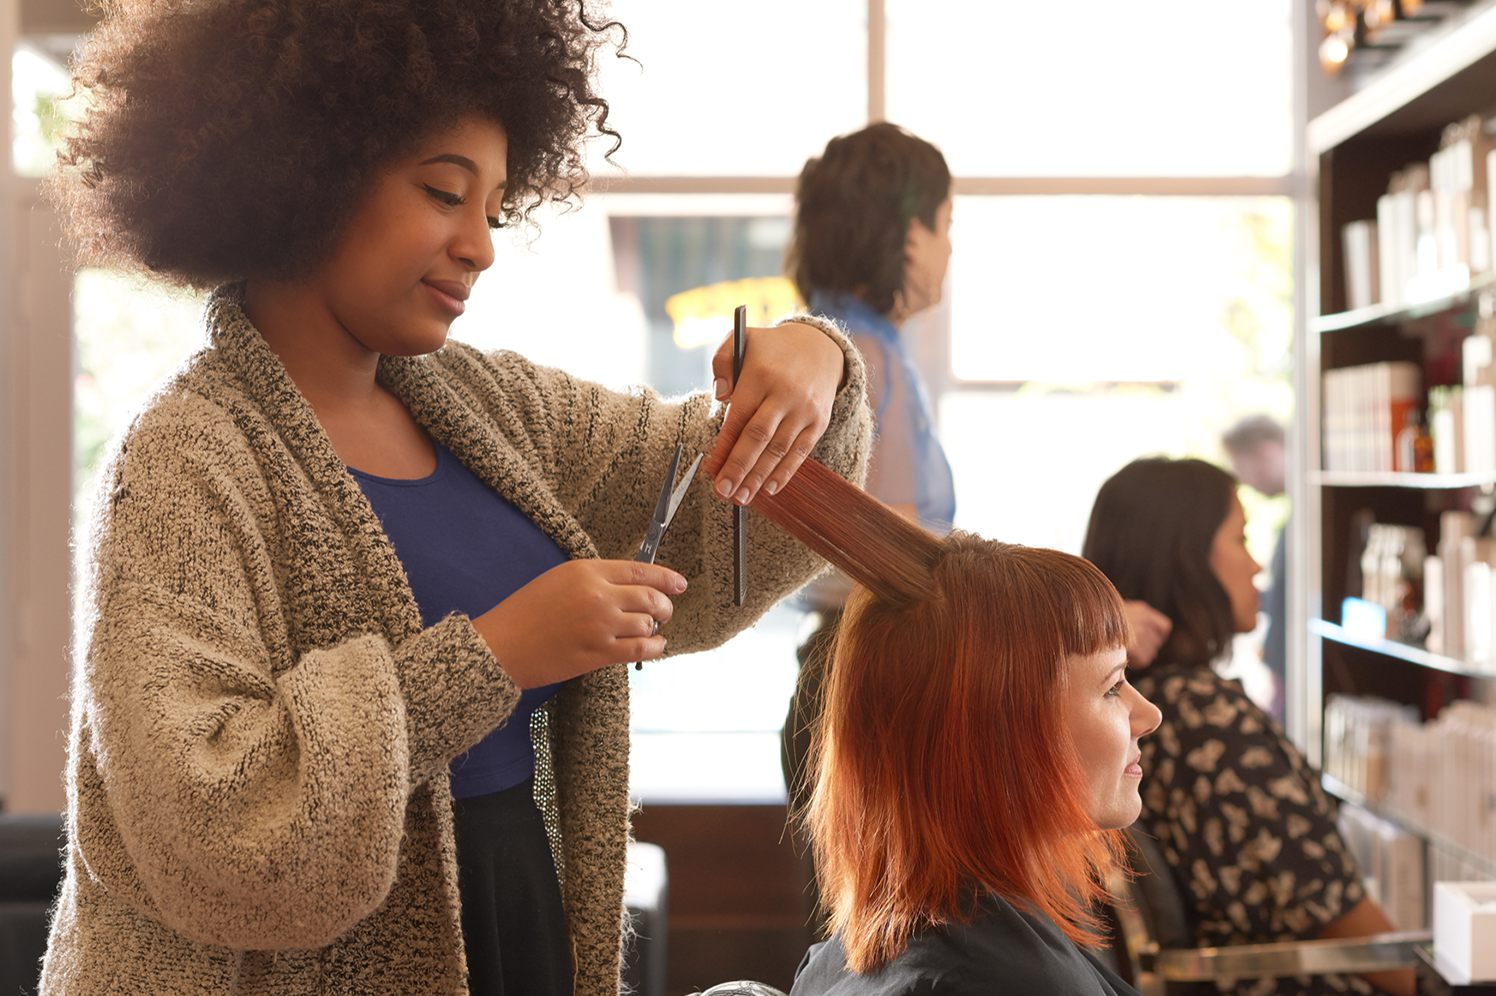 hair stylist and customer in salon